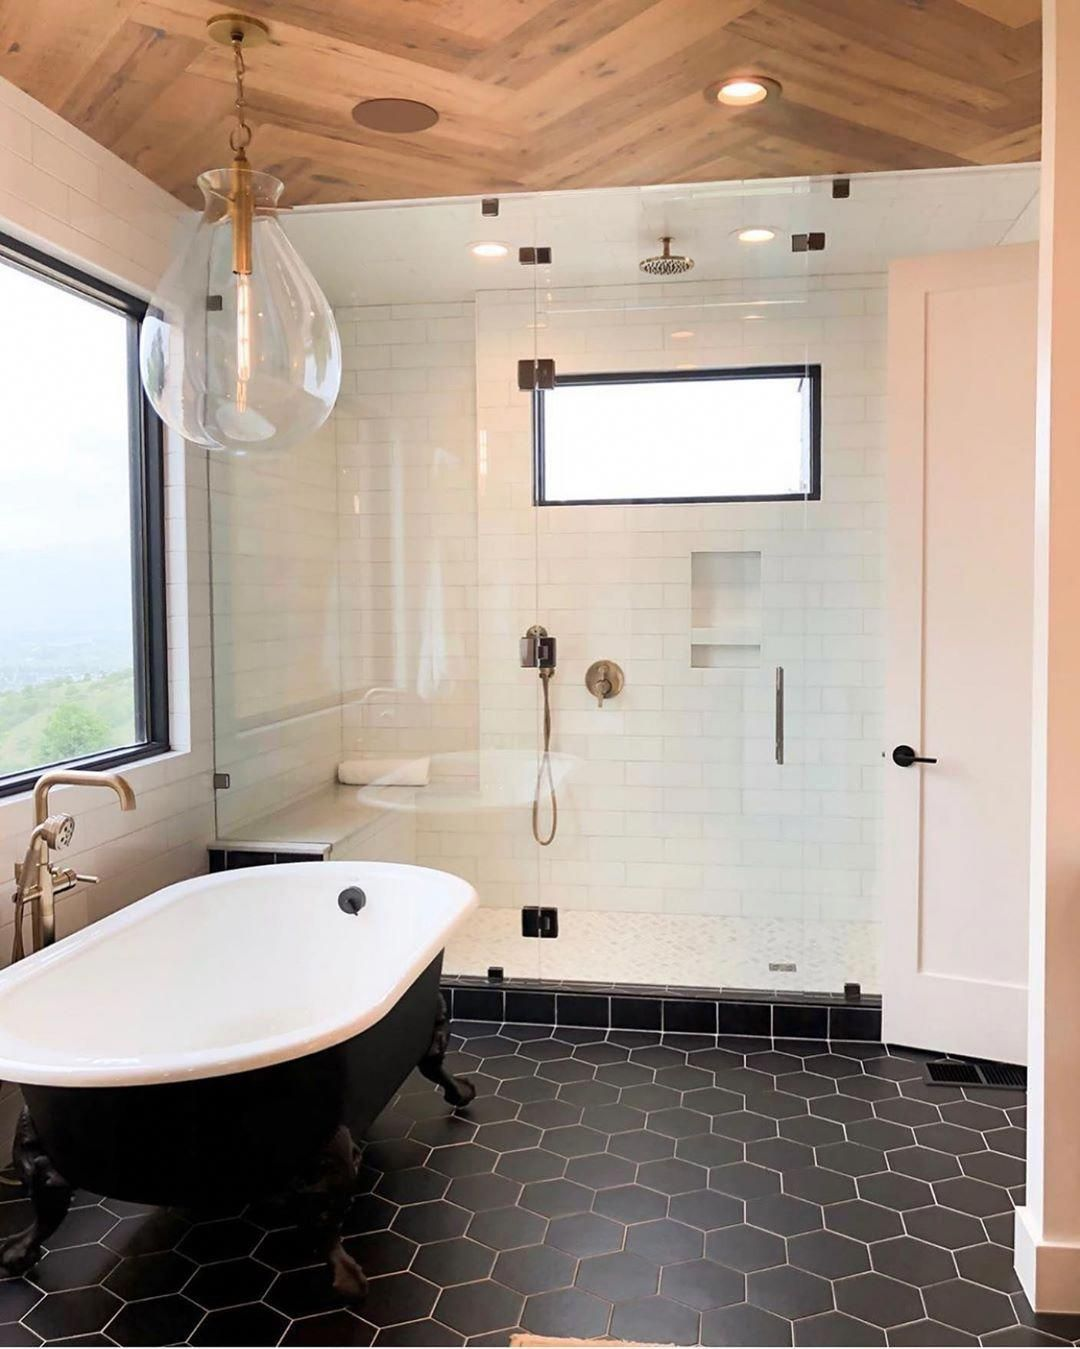 Pin by Andrea Speth on BASEMENT BEAUTY in 2020 Bathroom